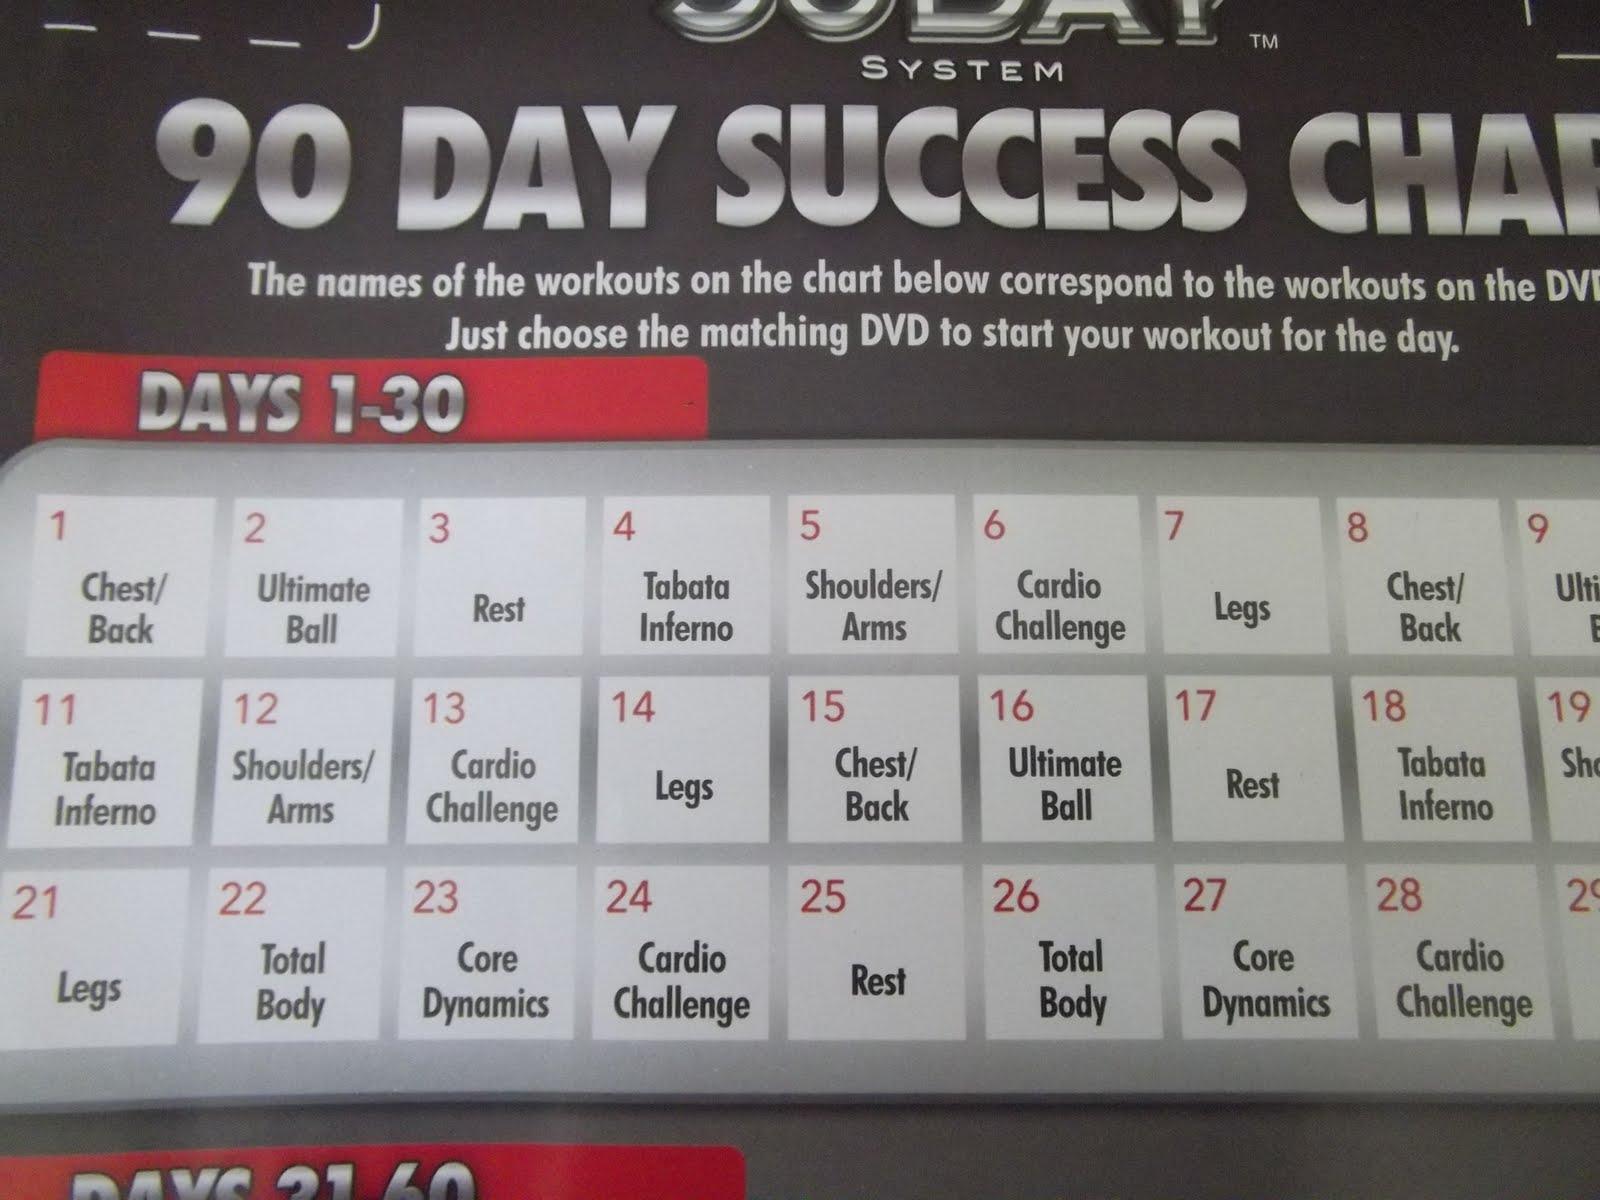 Supreme 90 Day Workout Cardio Challenge - Workoutwalls For 90 Day Supreme Workout Calendar